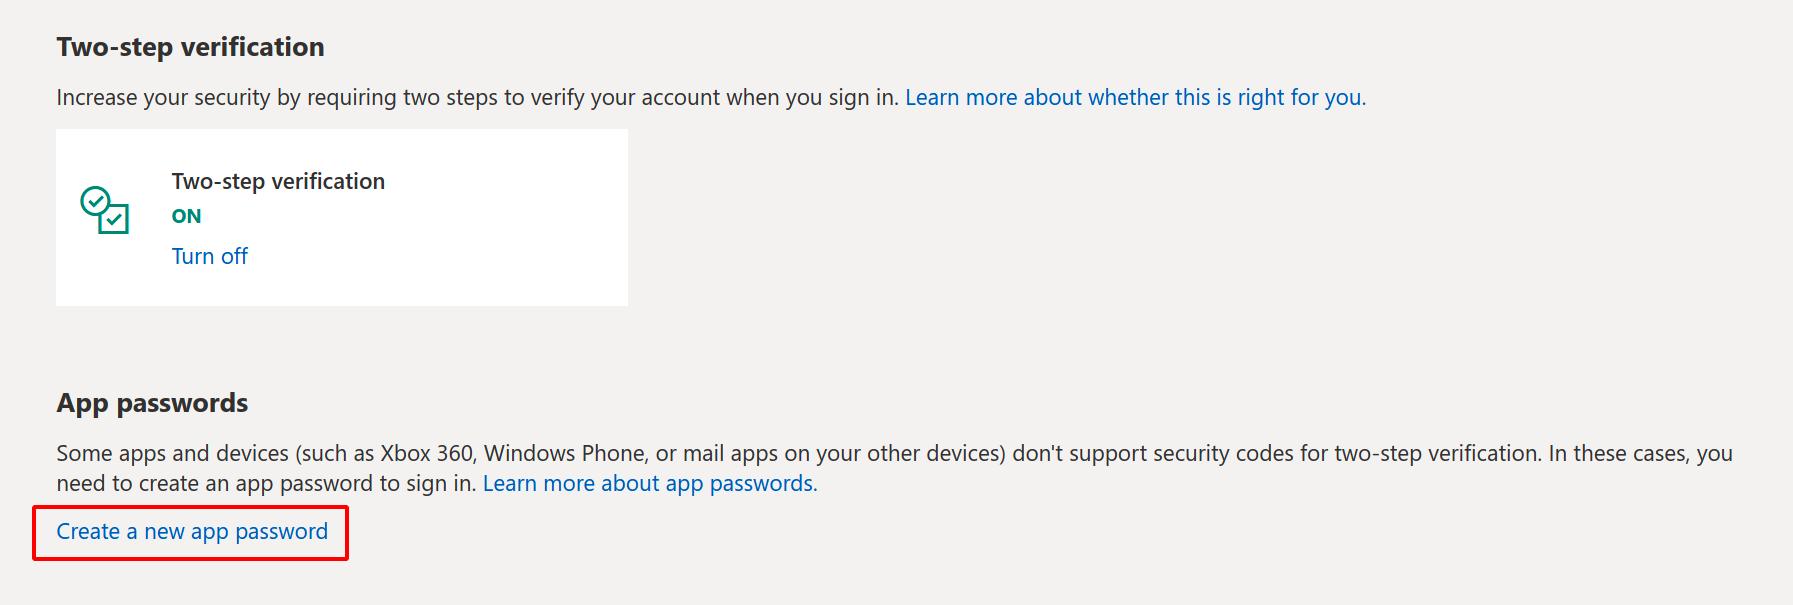 Create an app password